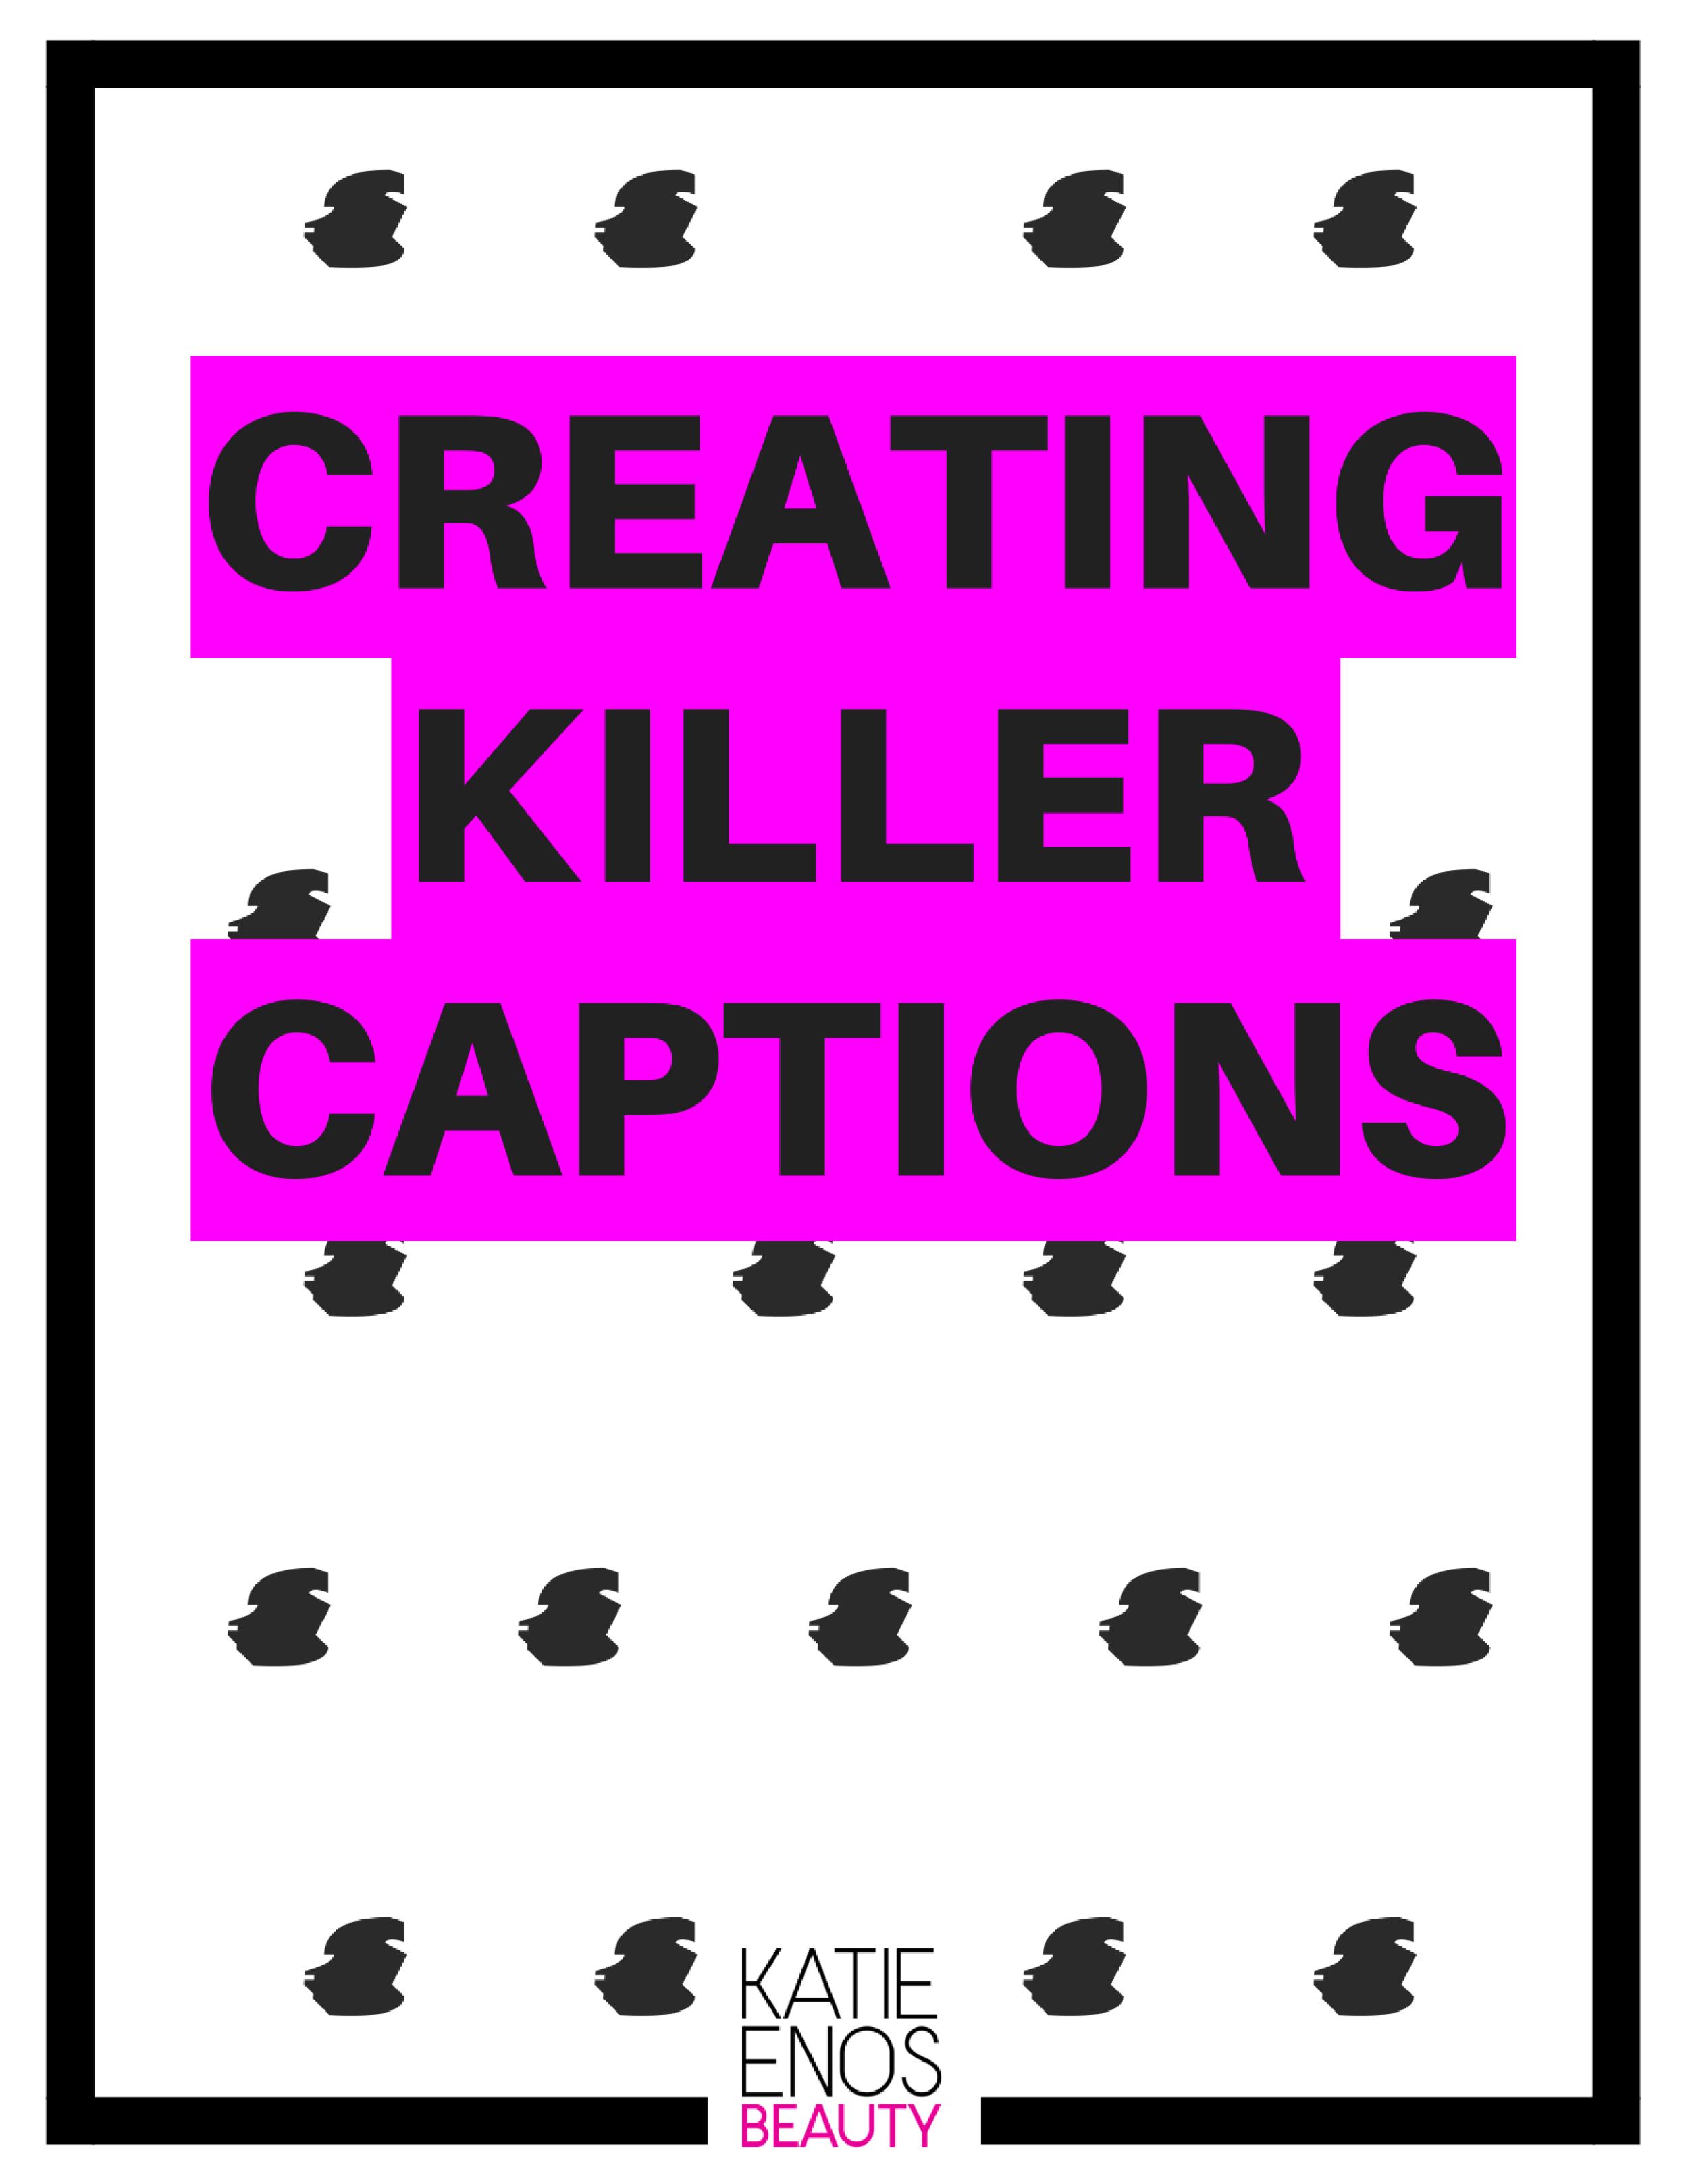 CREATING KILLER CAPTIONS.png